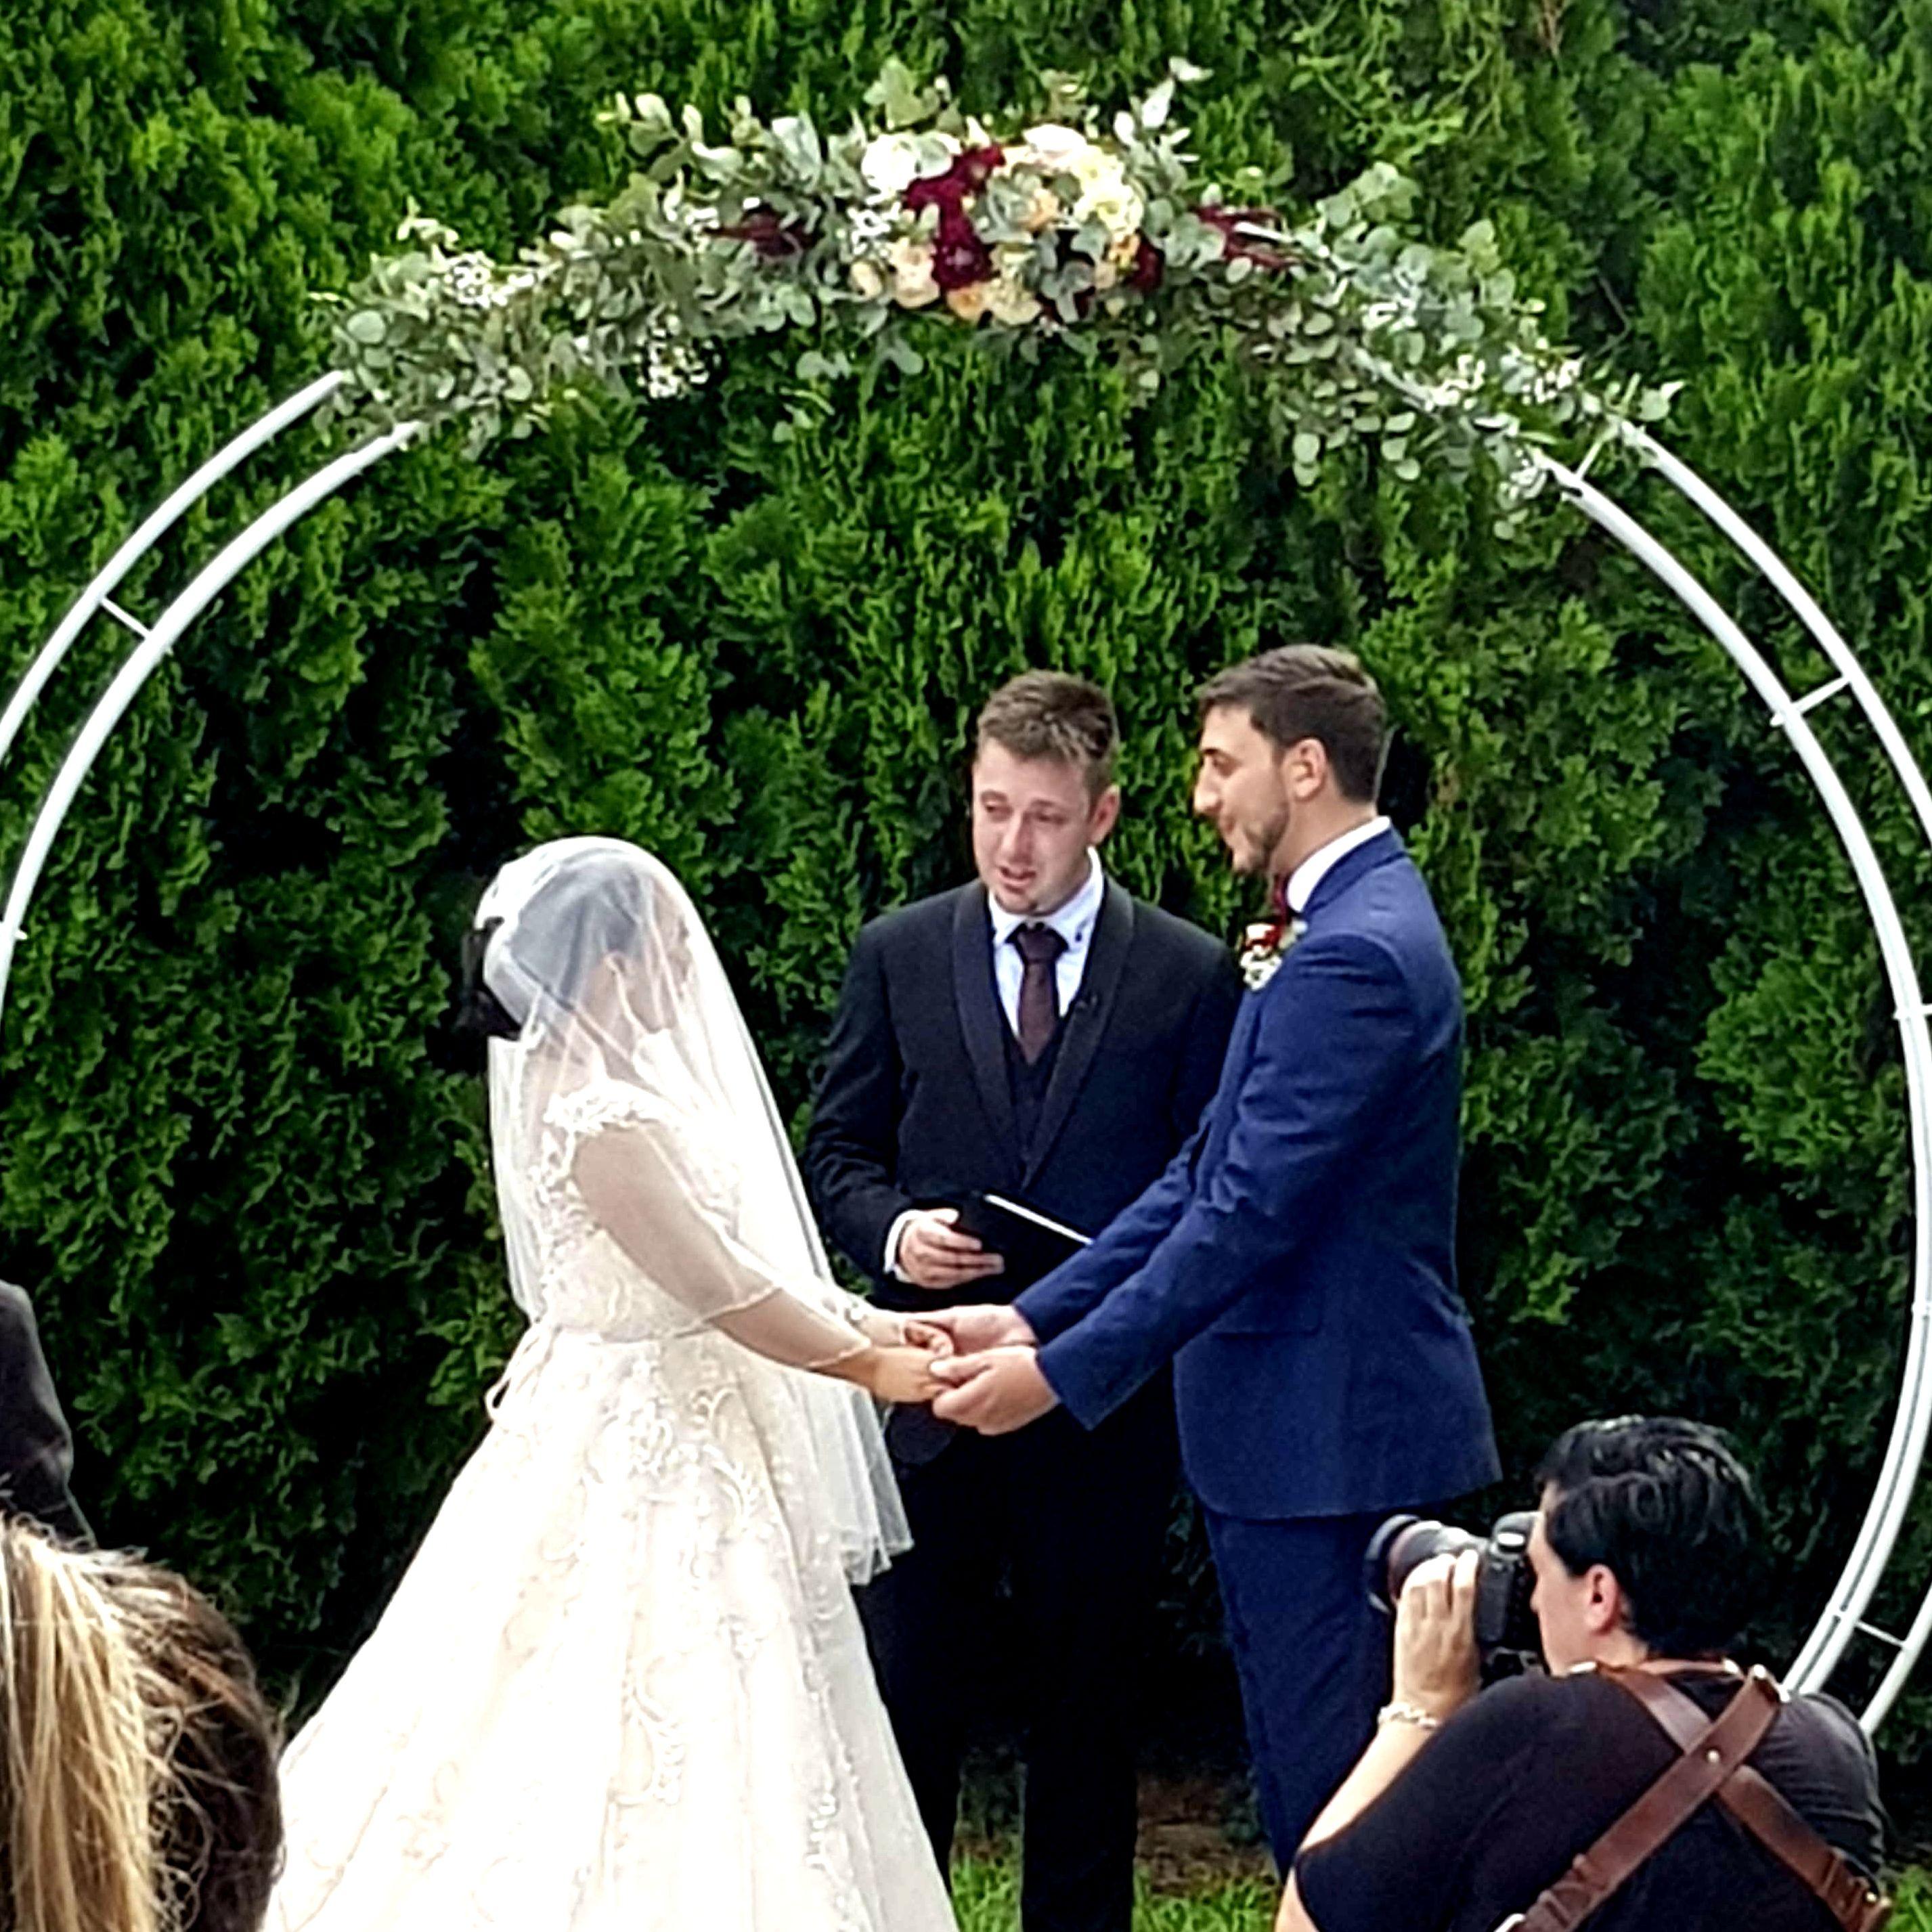 Fun Celebrant, Hawkesbury Celebrant, Sydney Celebrant, Master of Ceremonies Sydney, Customised Ceremony, Wedding Ceremony, Wedding Celebrant Sydney